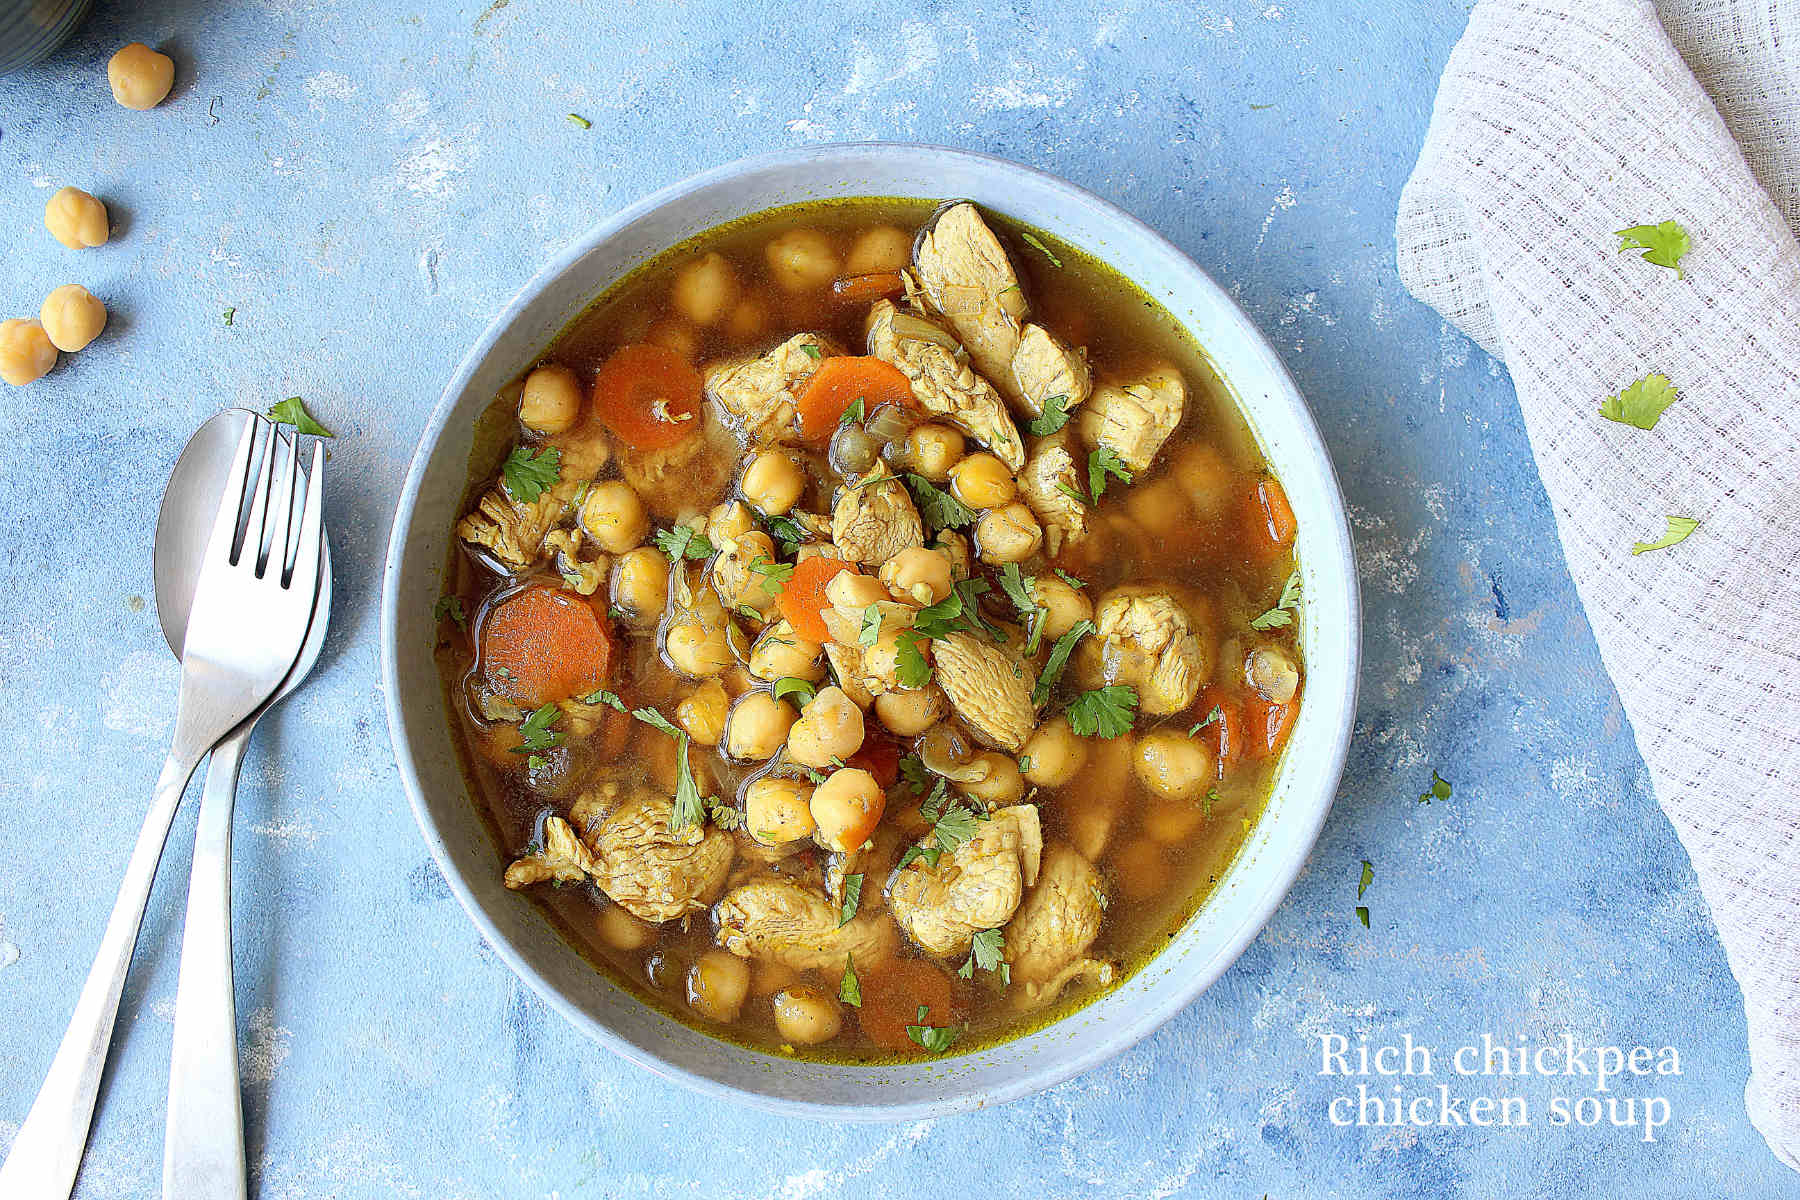 Rich chickpea chicken soup